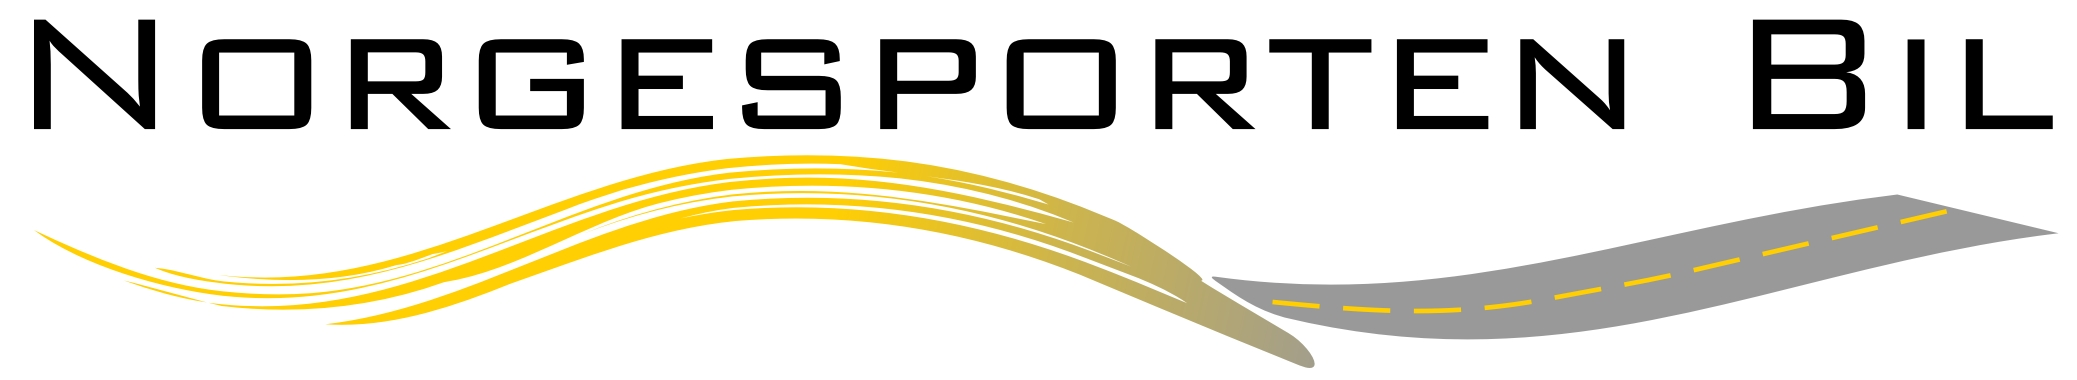 https://smaalenenecup.no/wp-content/uploads/2018/05/Norgesporten-bil-Logo.jpg